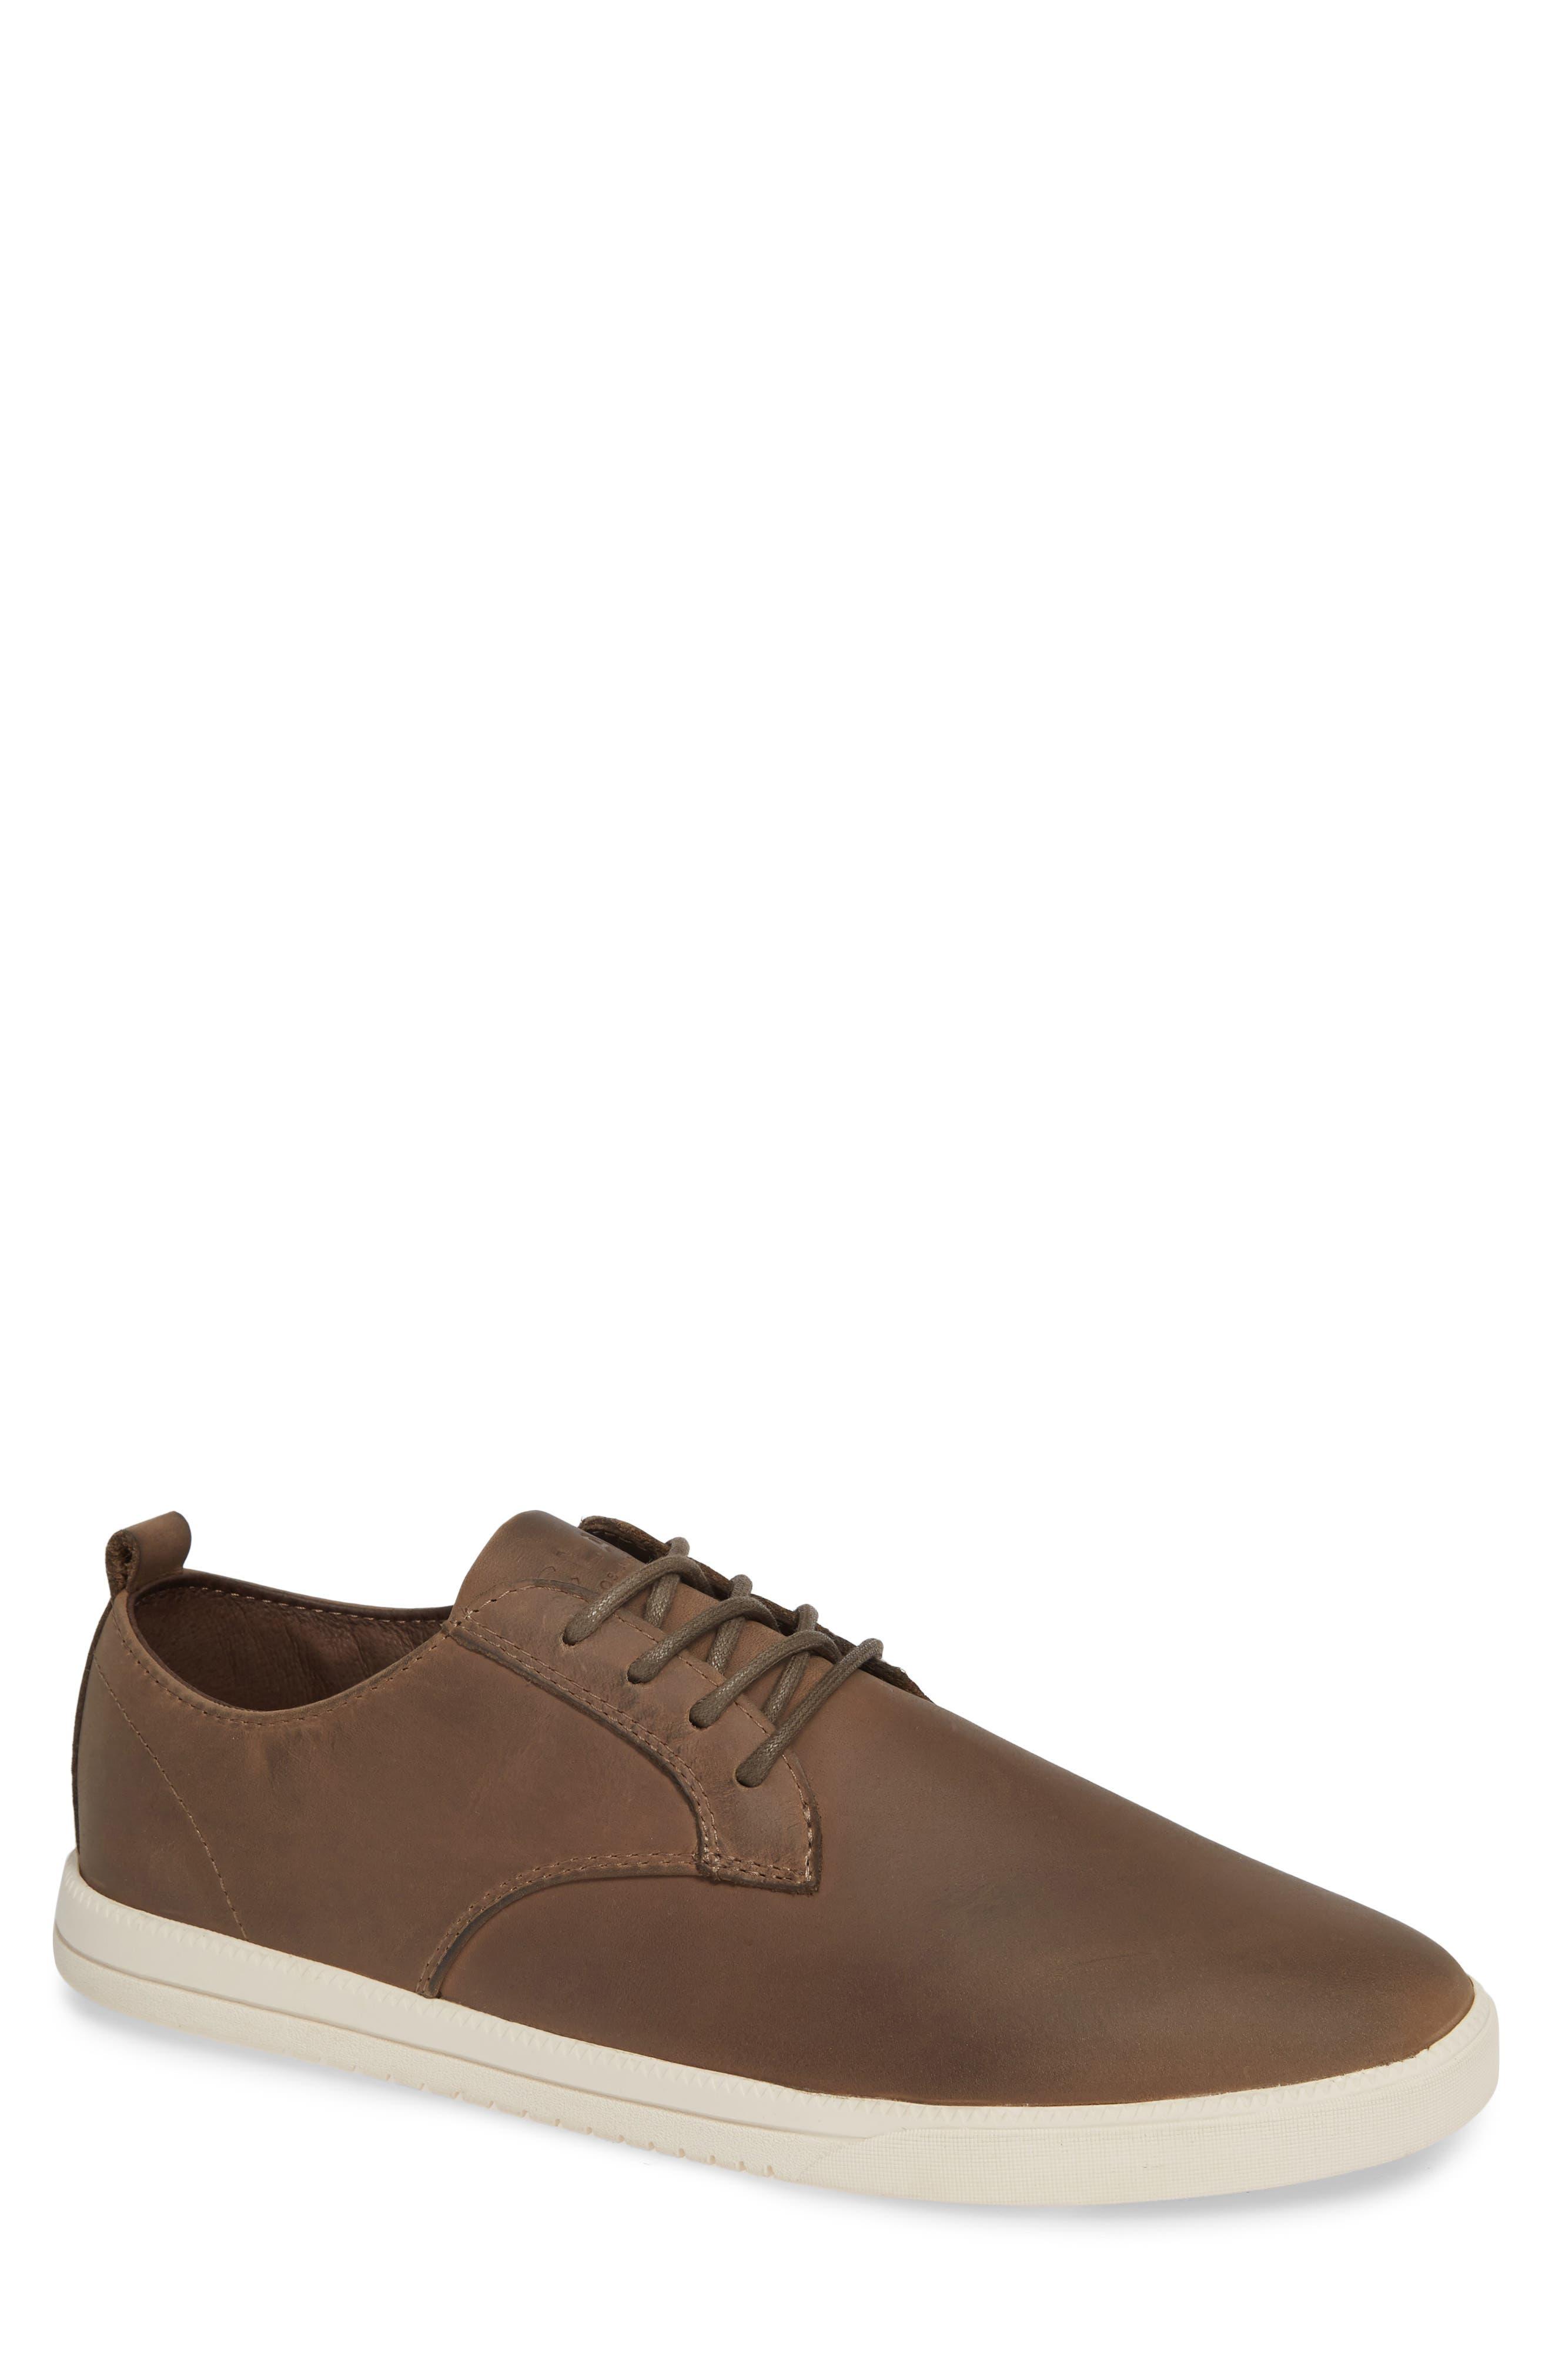 'Ellington' Sneaker,                         Main,                         color, COFFEE FULL GRAIN LEATHER